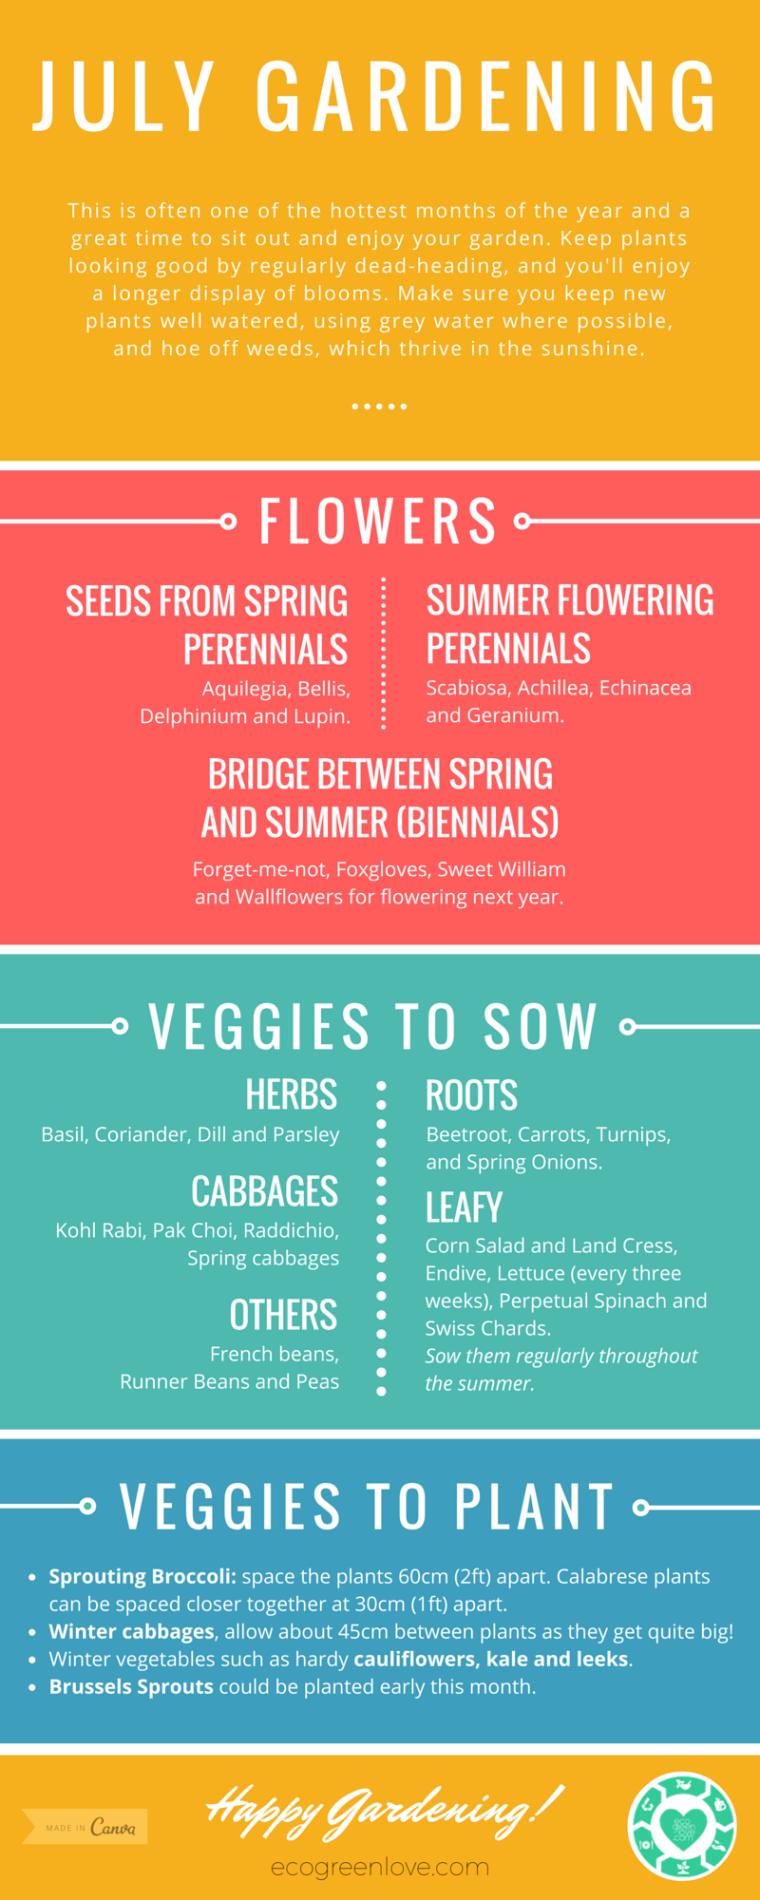 July seasonal gardening [Infographic] | ecogreenlove